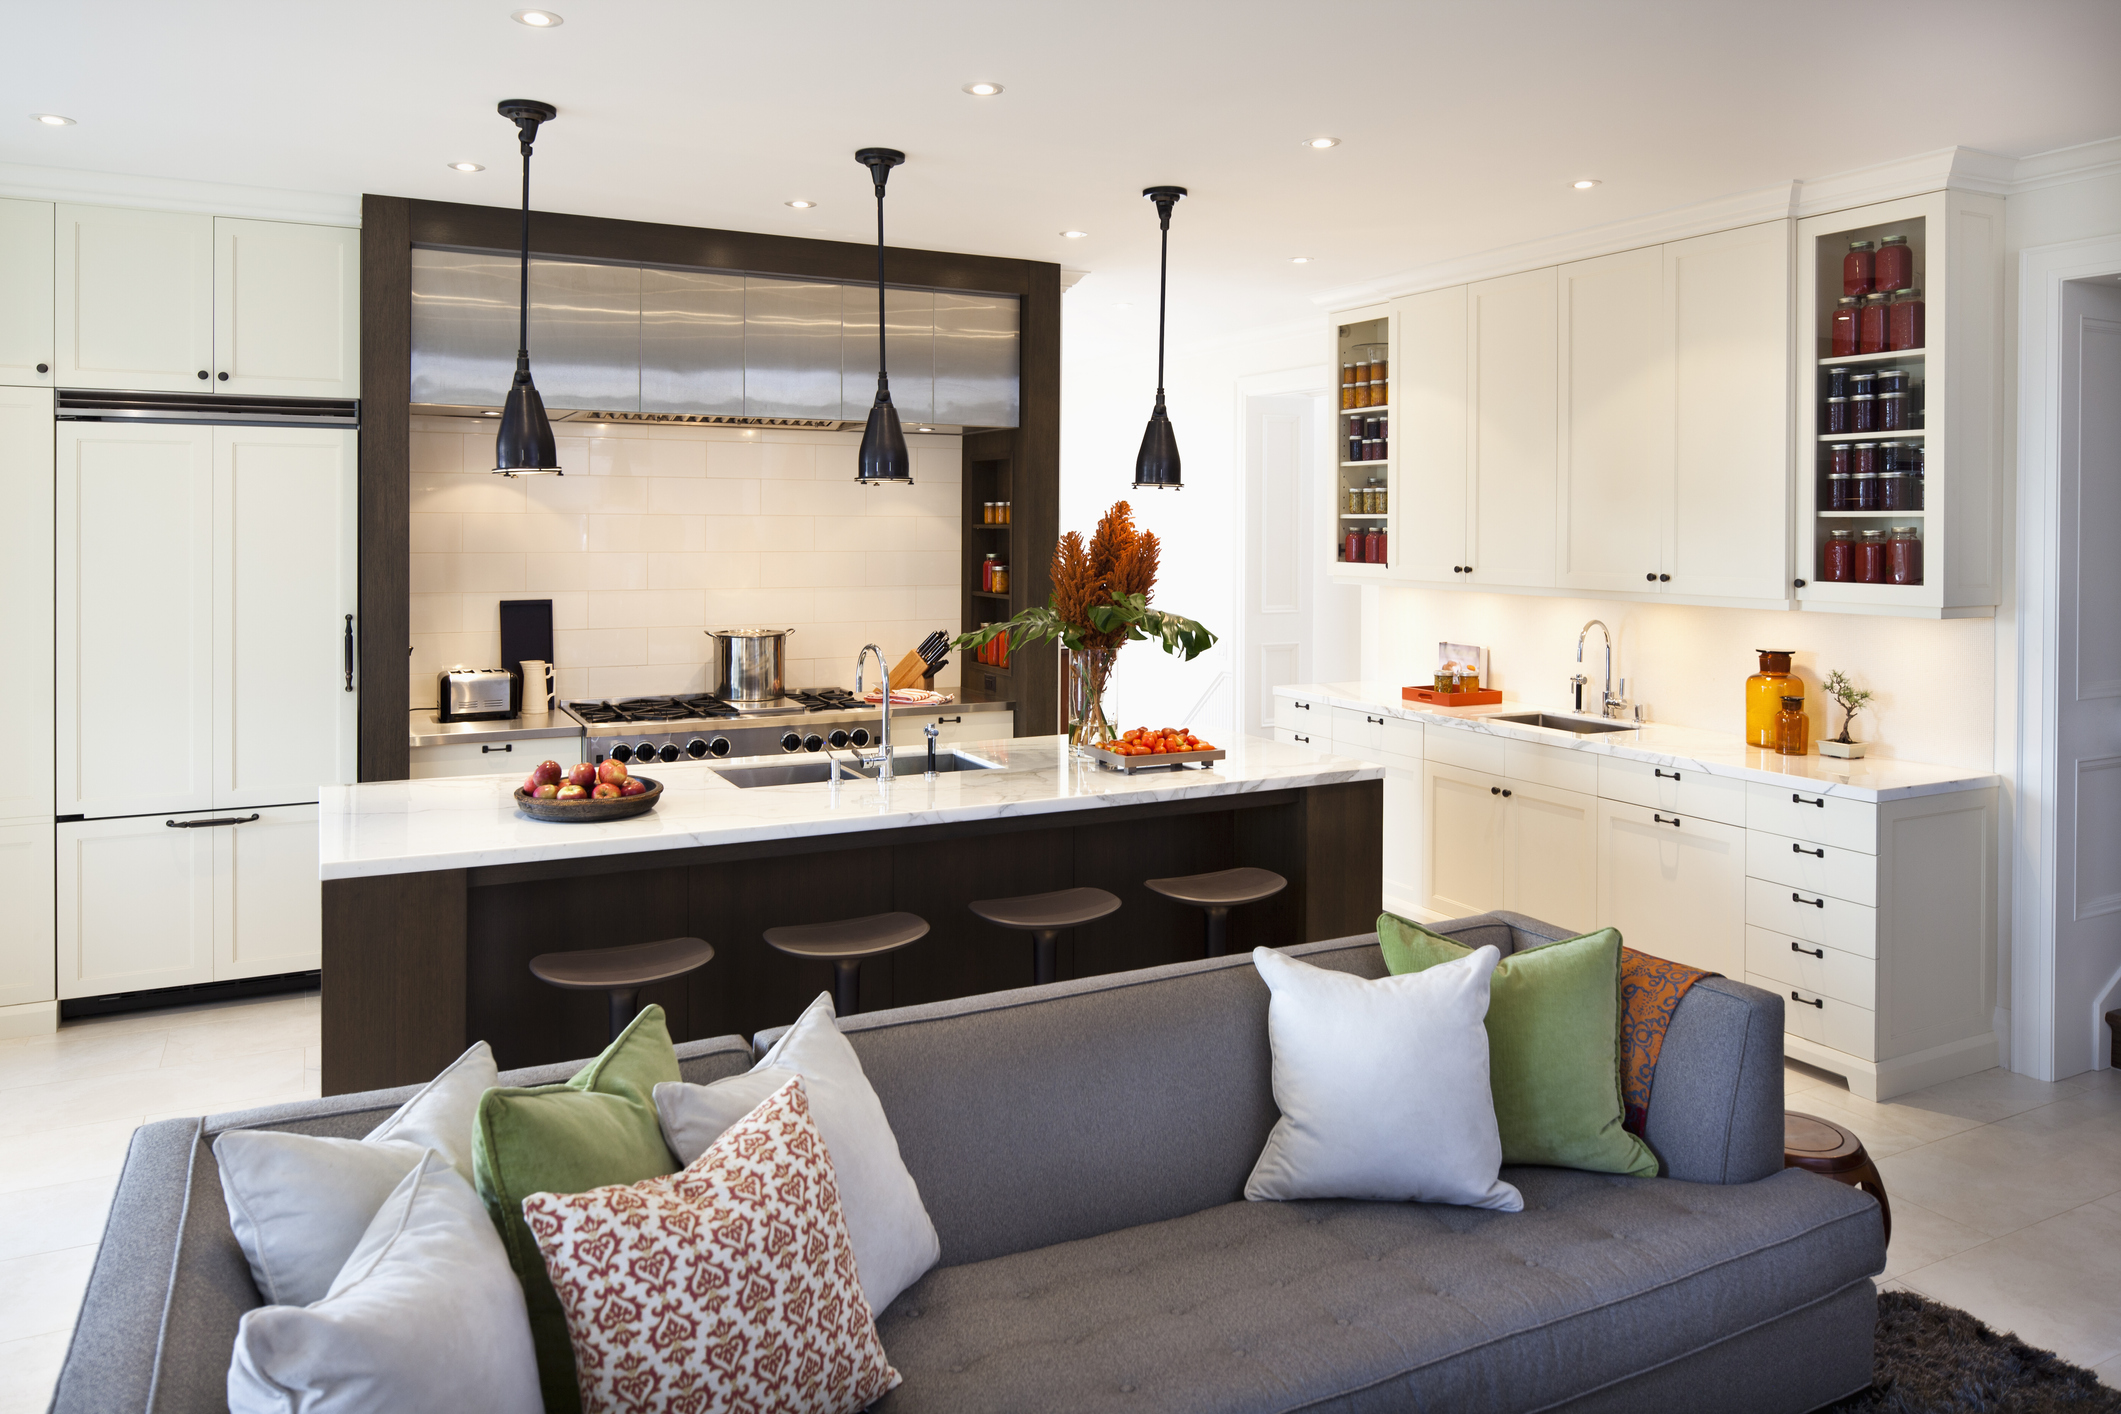 Modern-Kitchen-157677305_2122x1415.jpeg